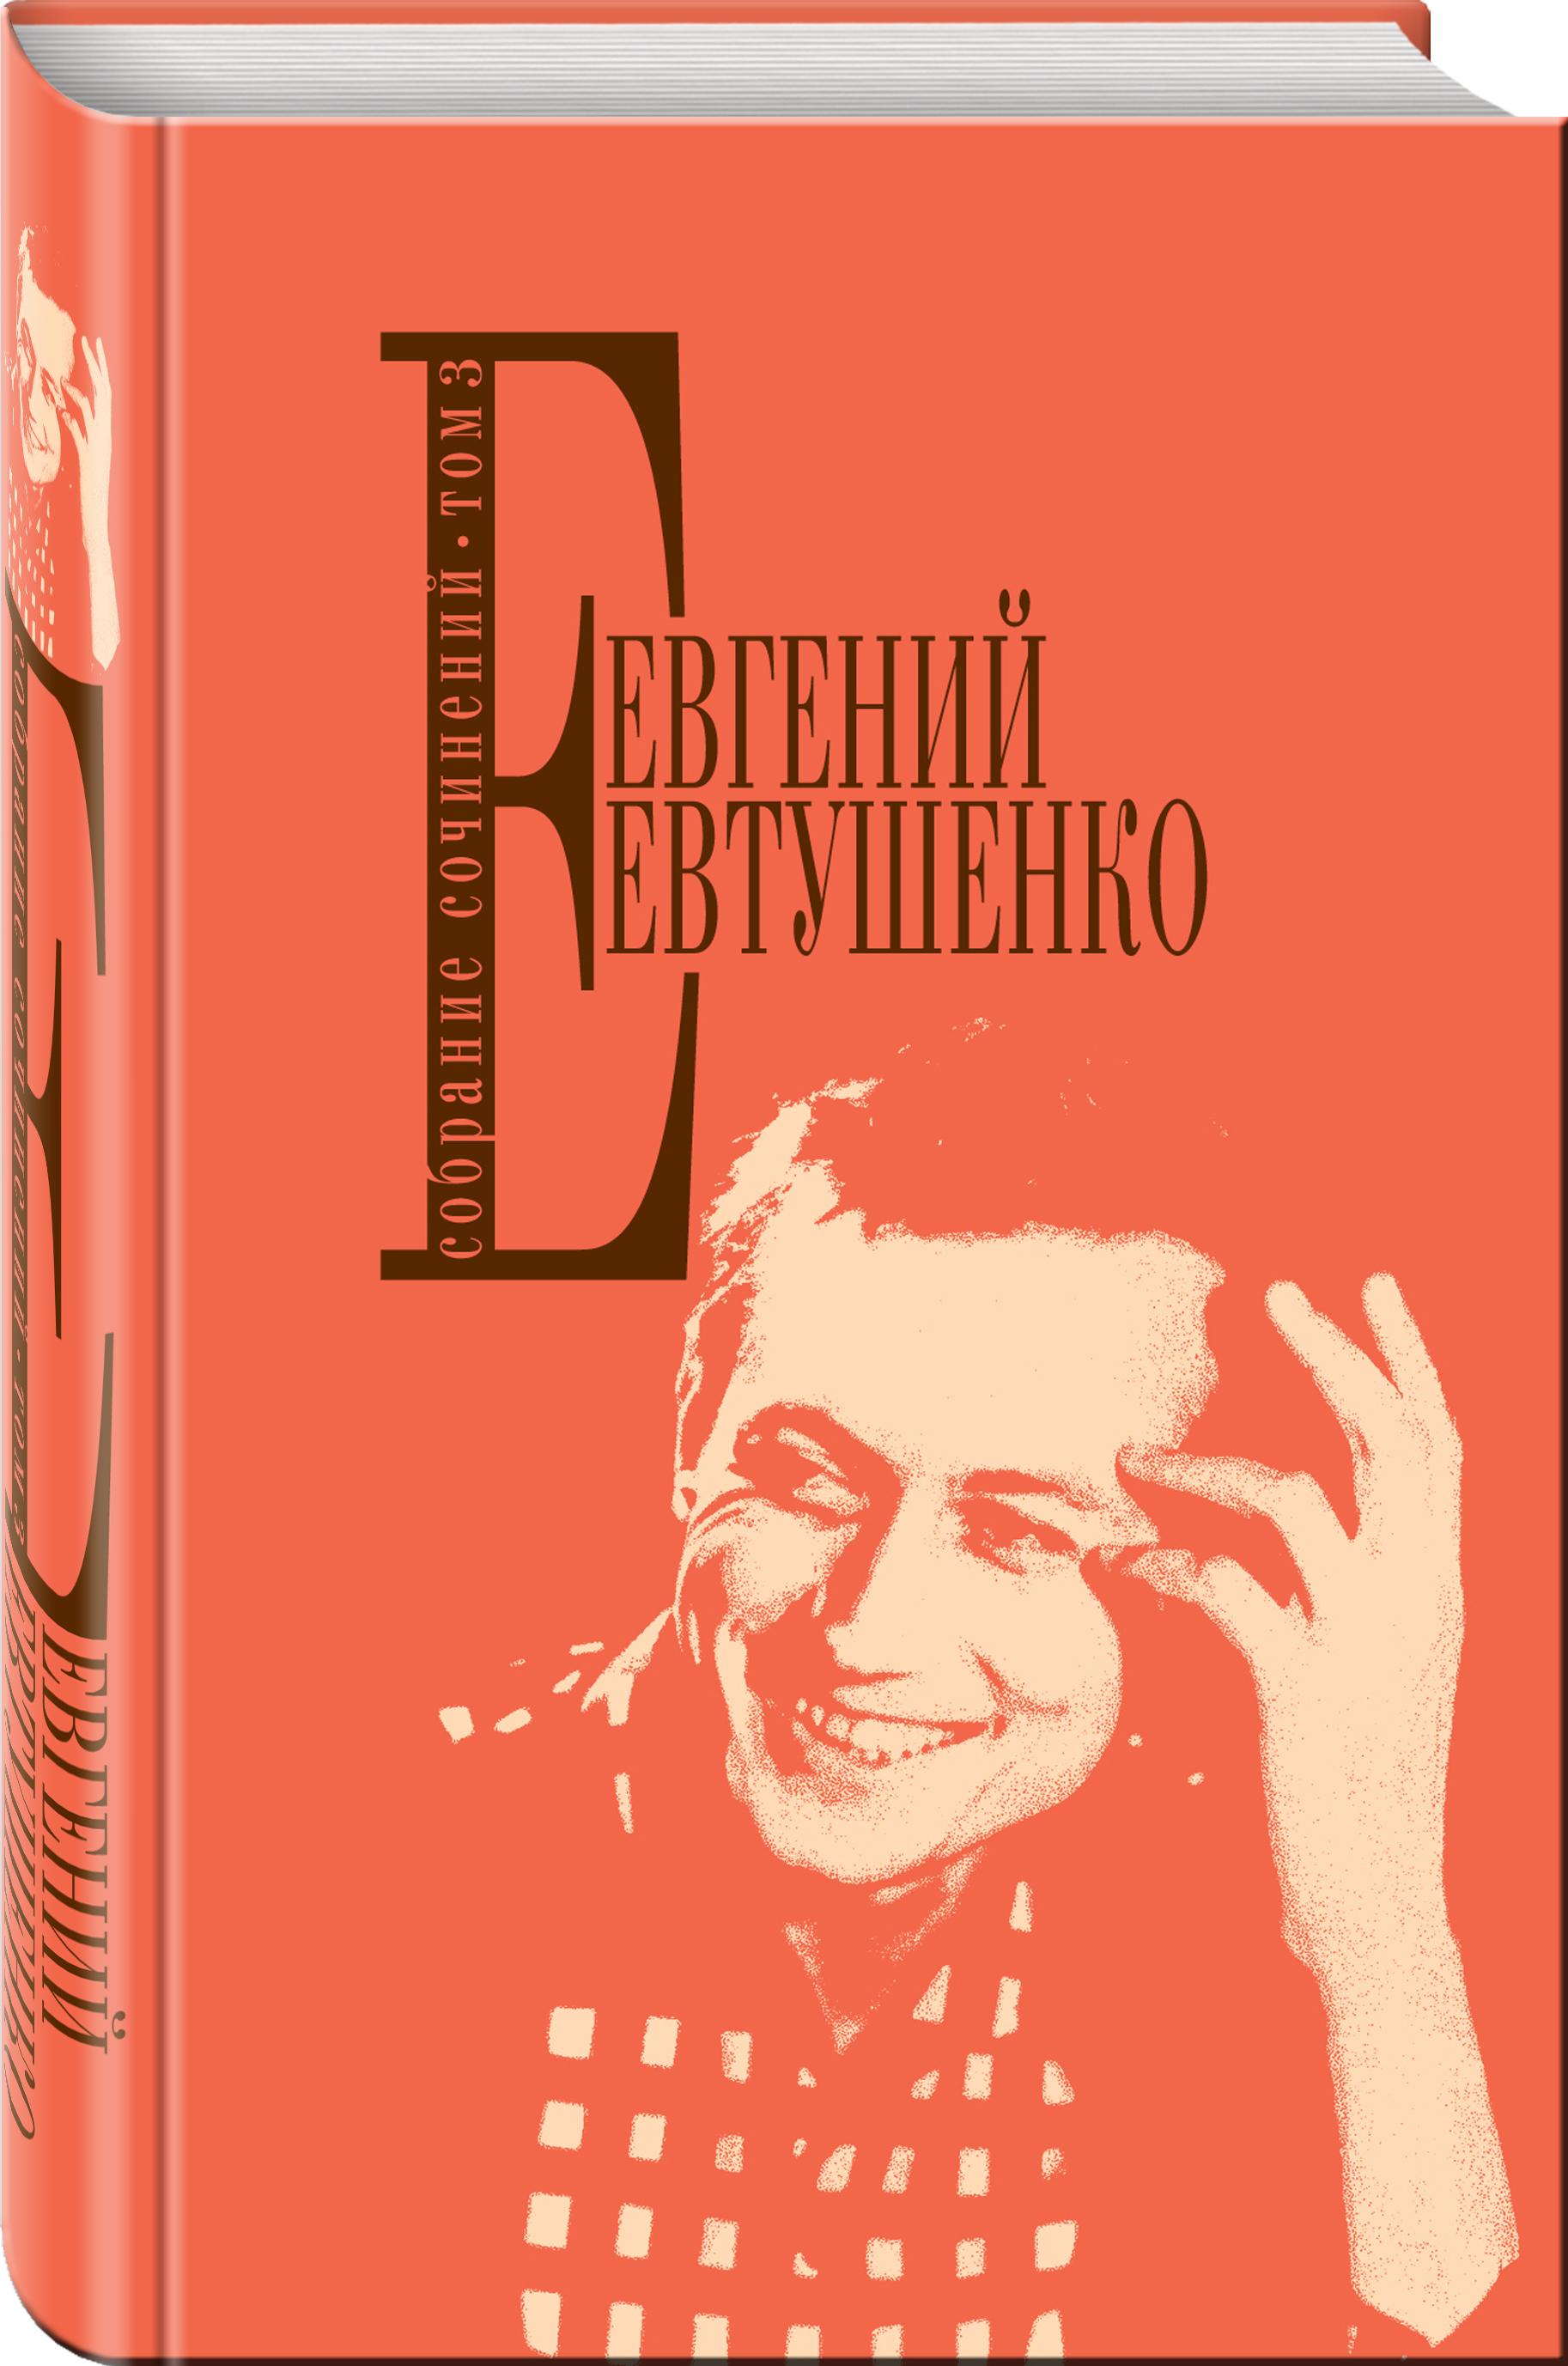 Евгений Евтушенко Собрание сочинений. Т. 3 евтушенко е евгений евтушенко собрание сочинений том 3